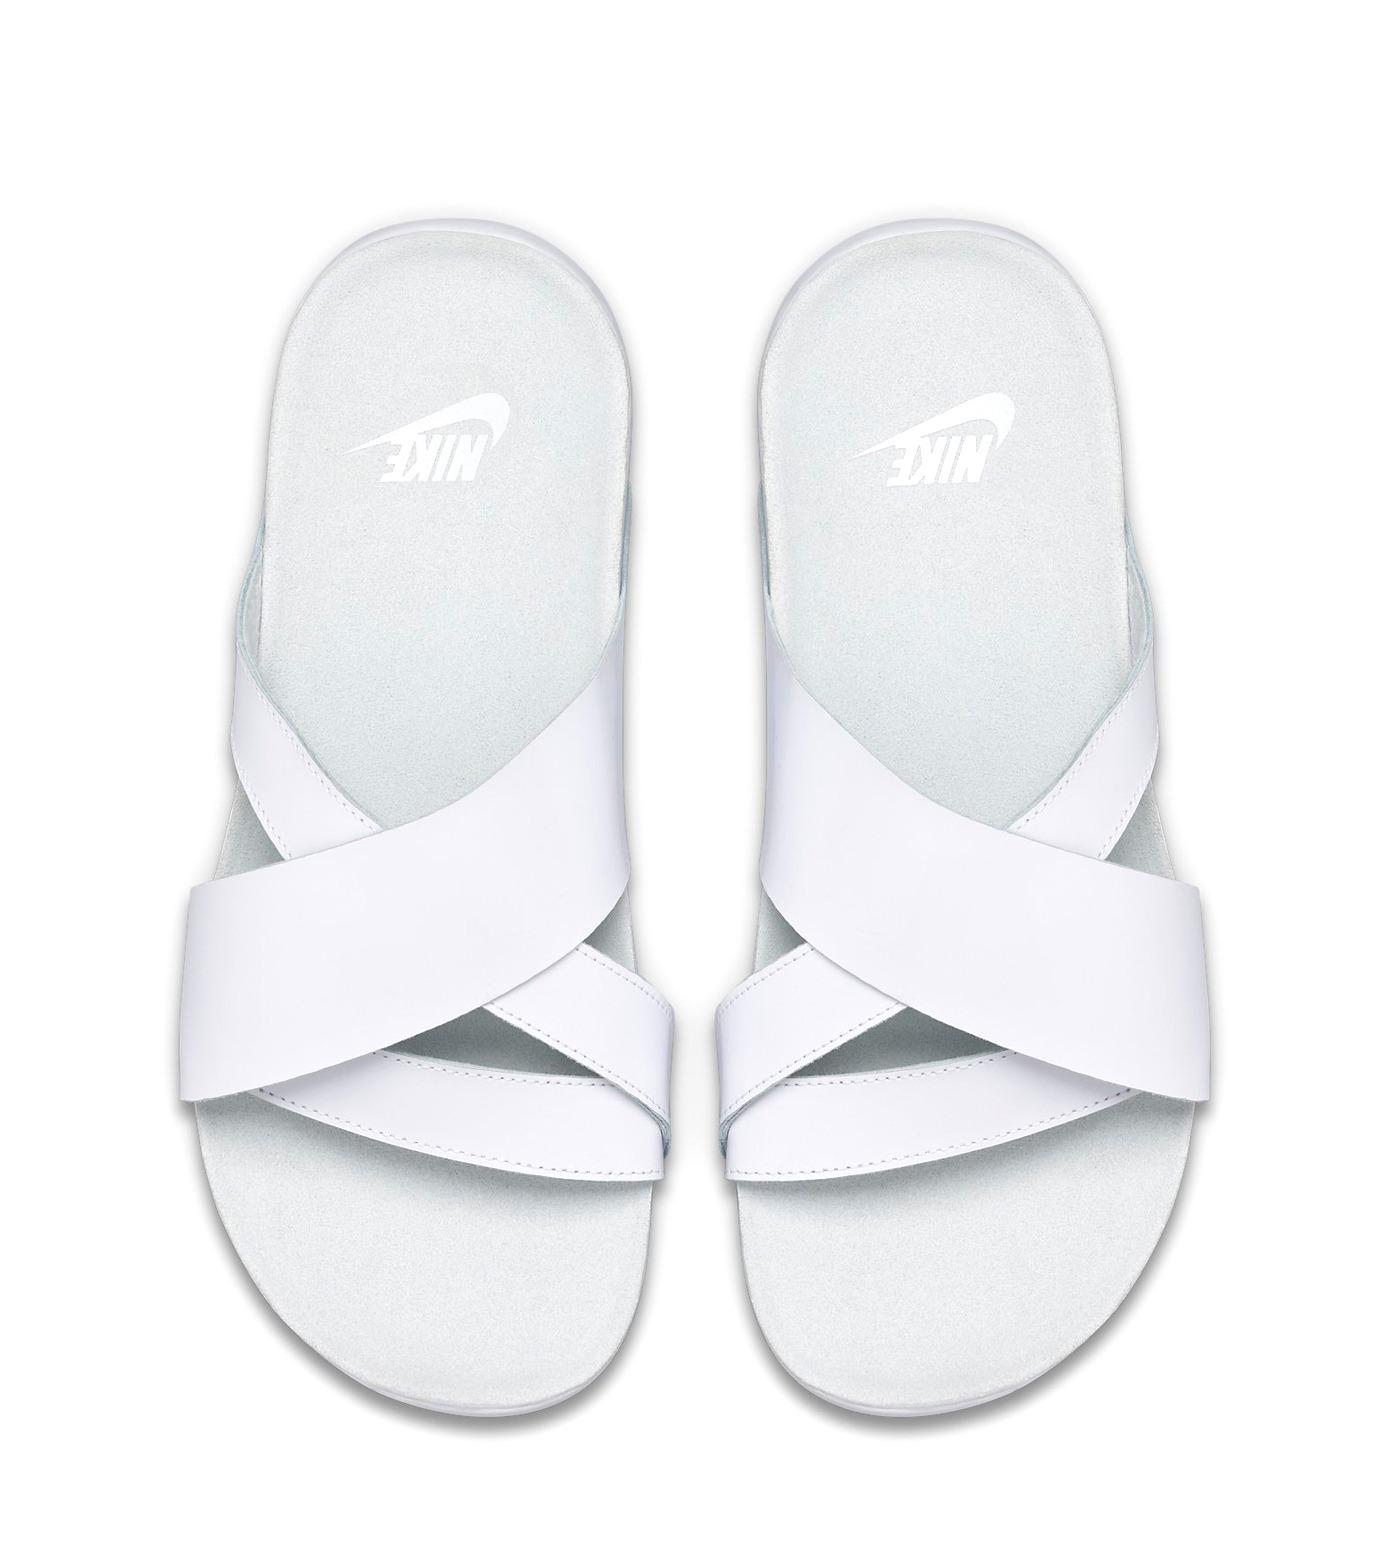 NIKE(ナイキ)のTaupo-WHITE(シューズ/shoes)-849756-100-4 拡大詳細画像4